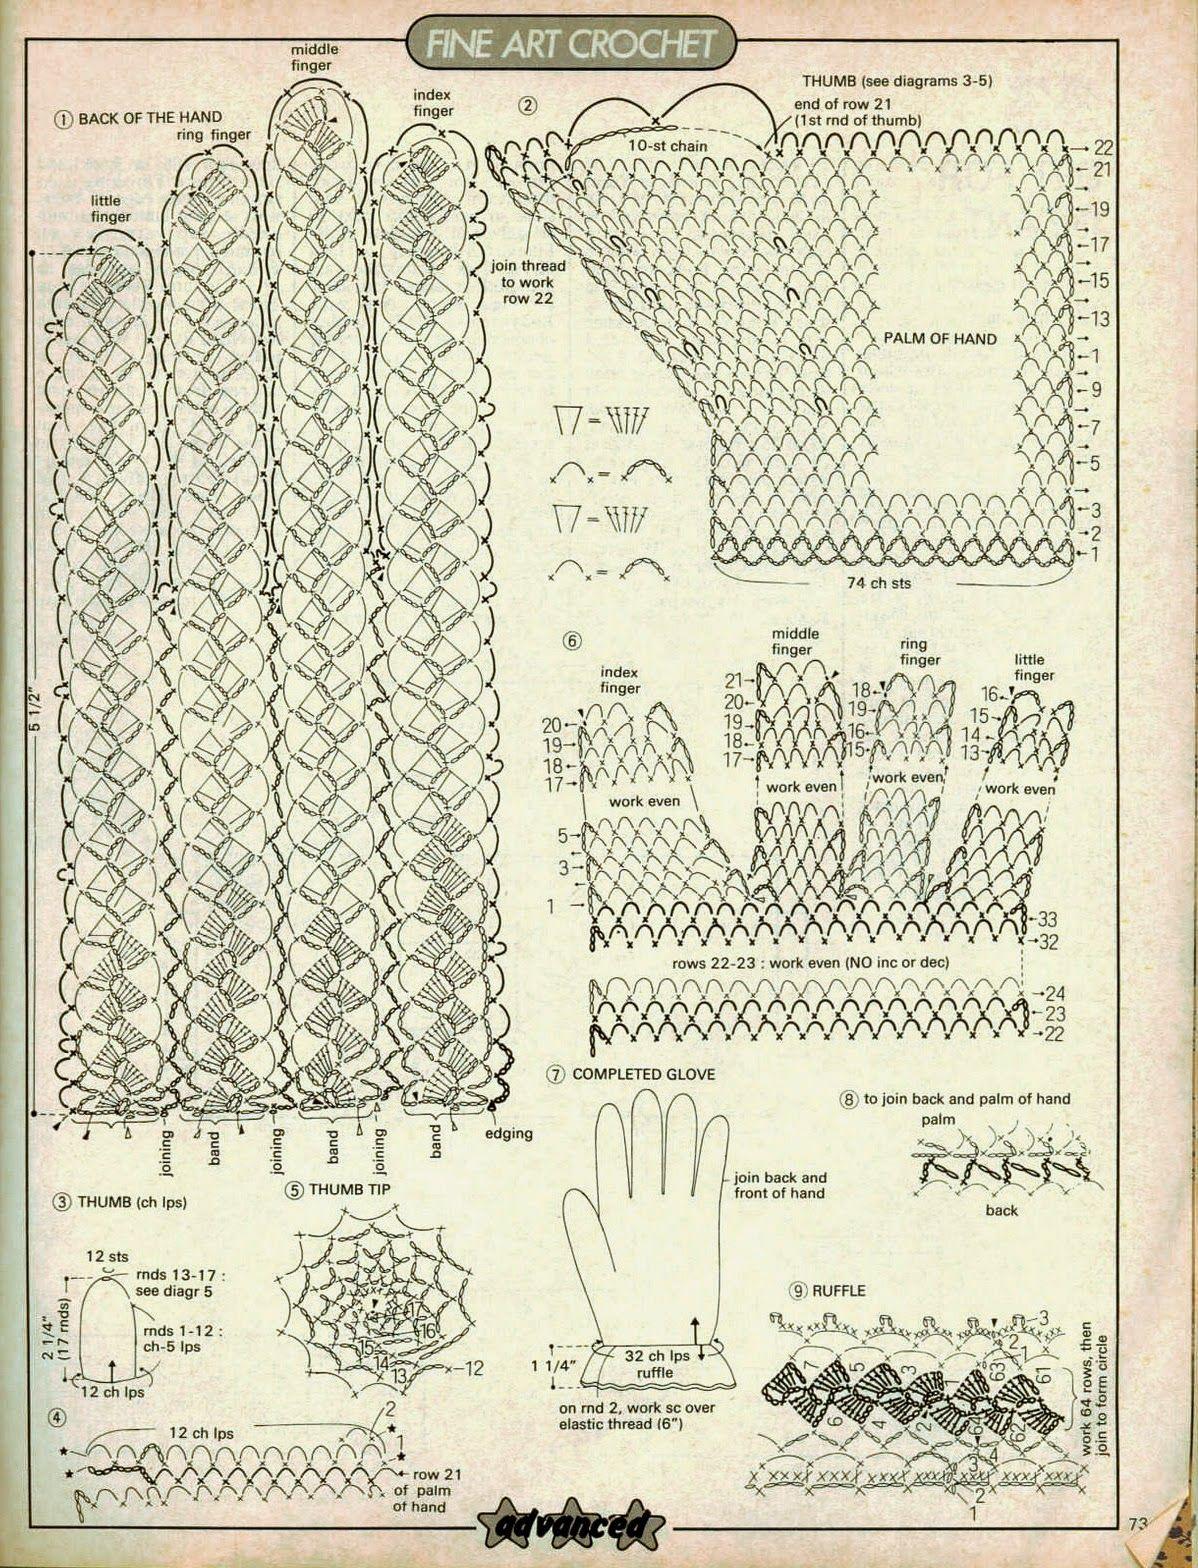 Crochet Gloves Free Pattern | Giftseshop.com knitting | Pinterest ...